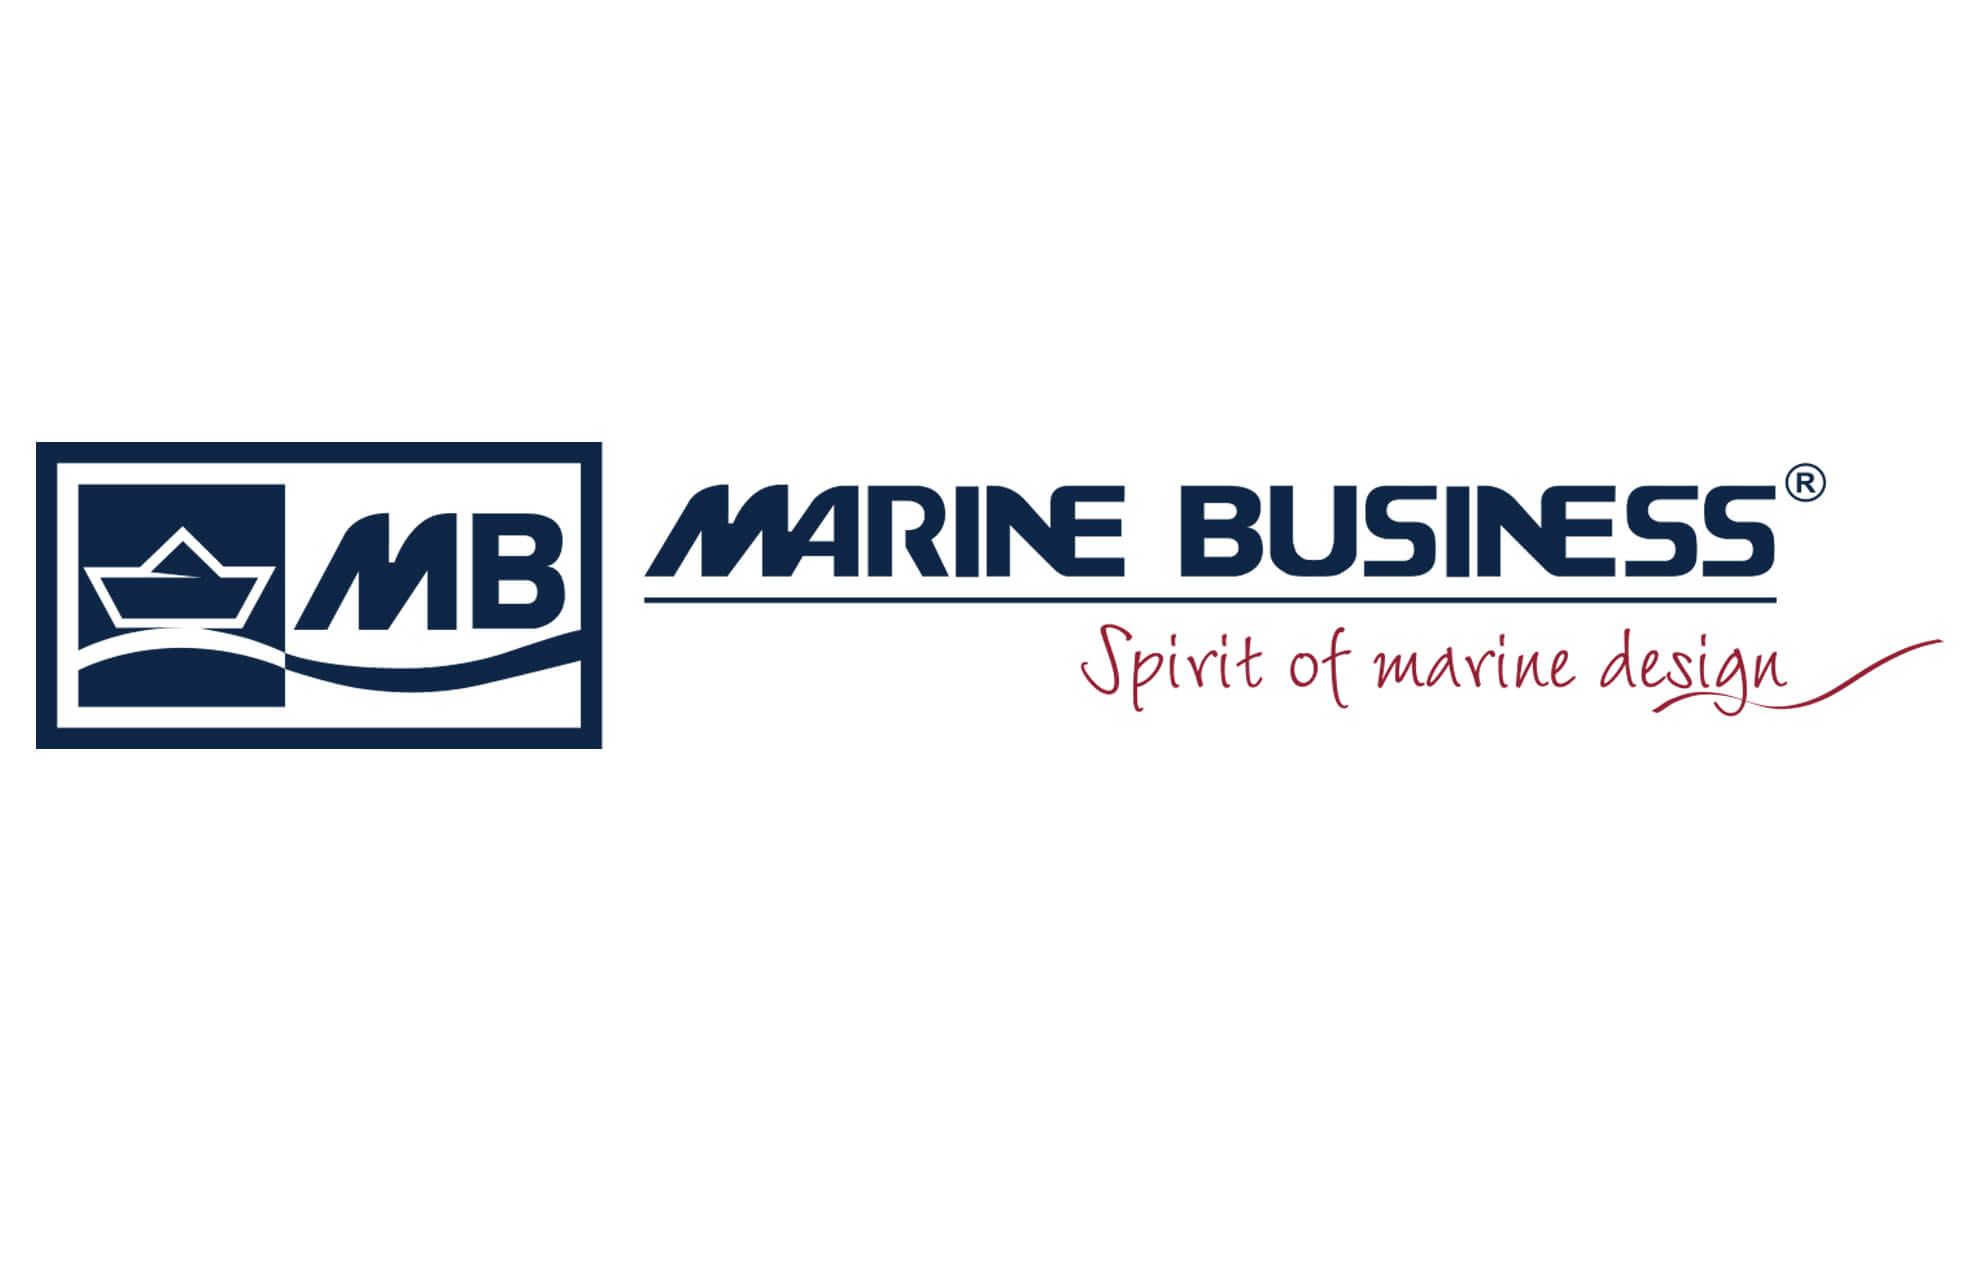 Logo mb restyling barcelona1 - Breanding. Restyling. Marine Business